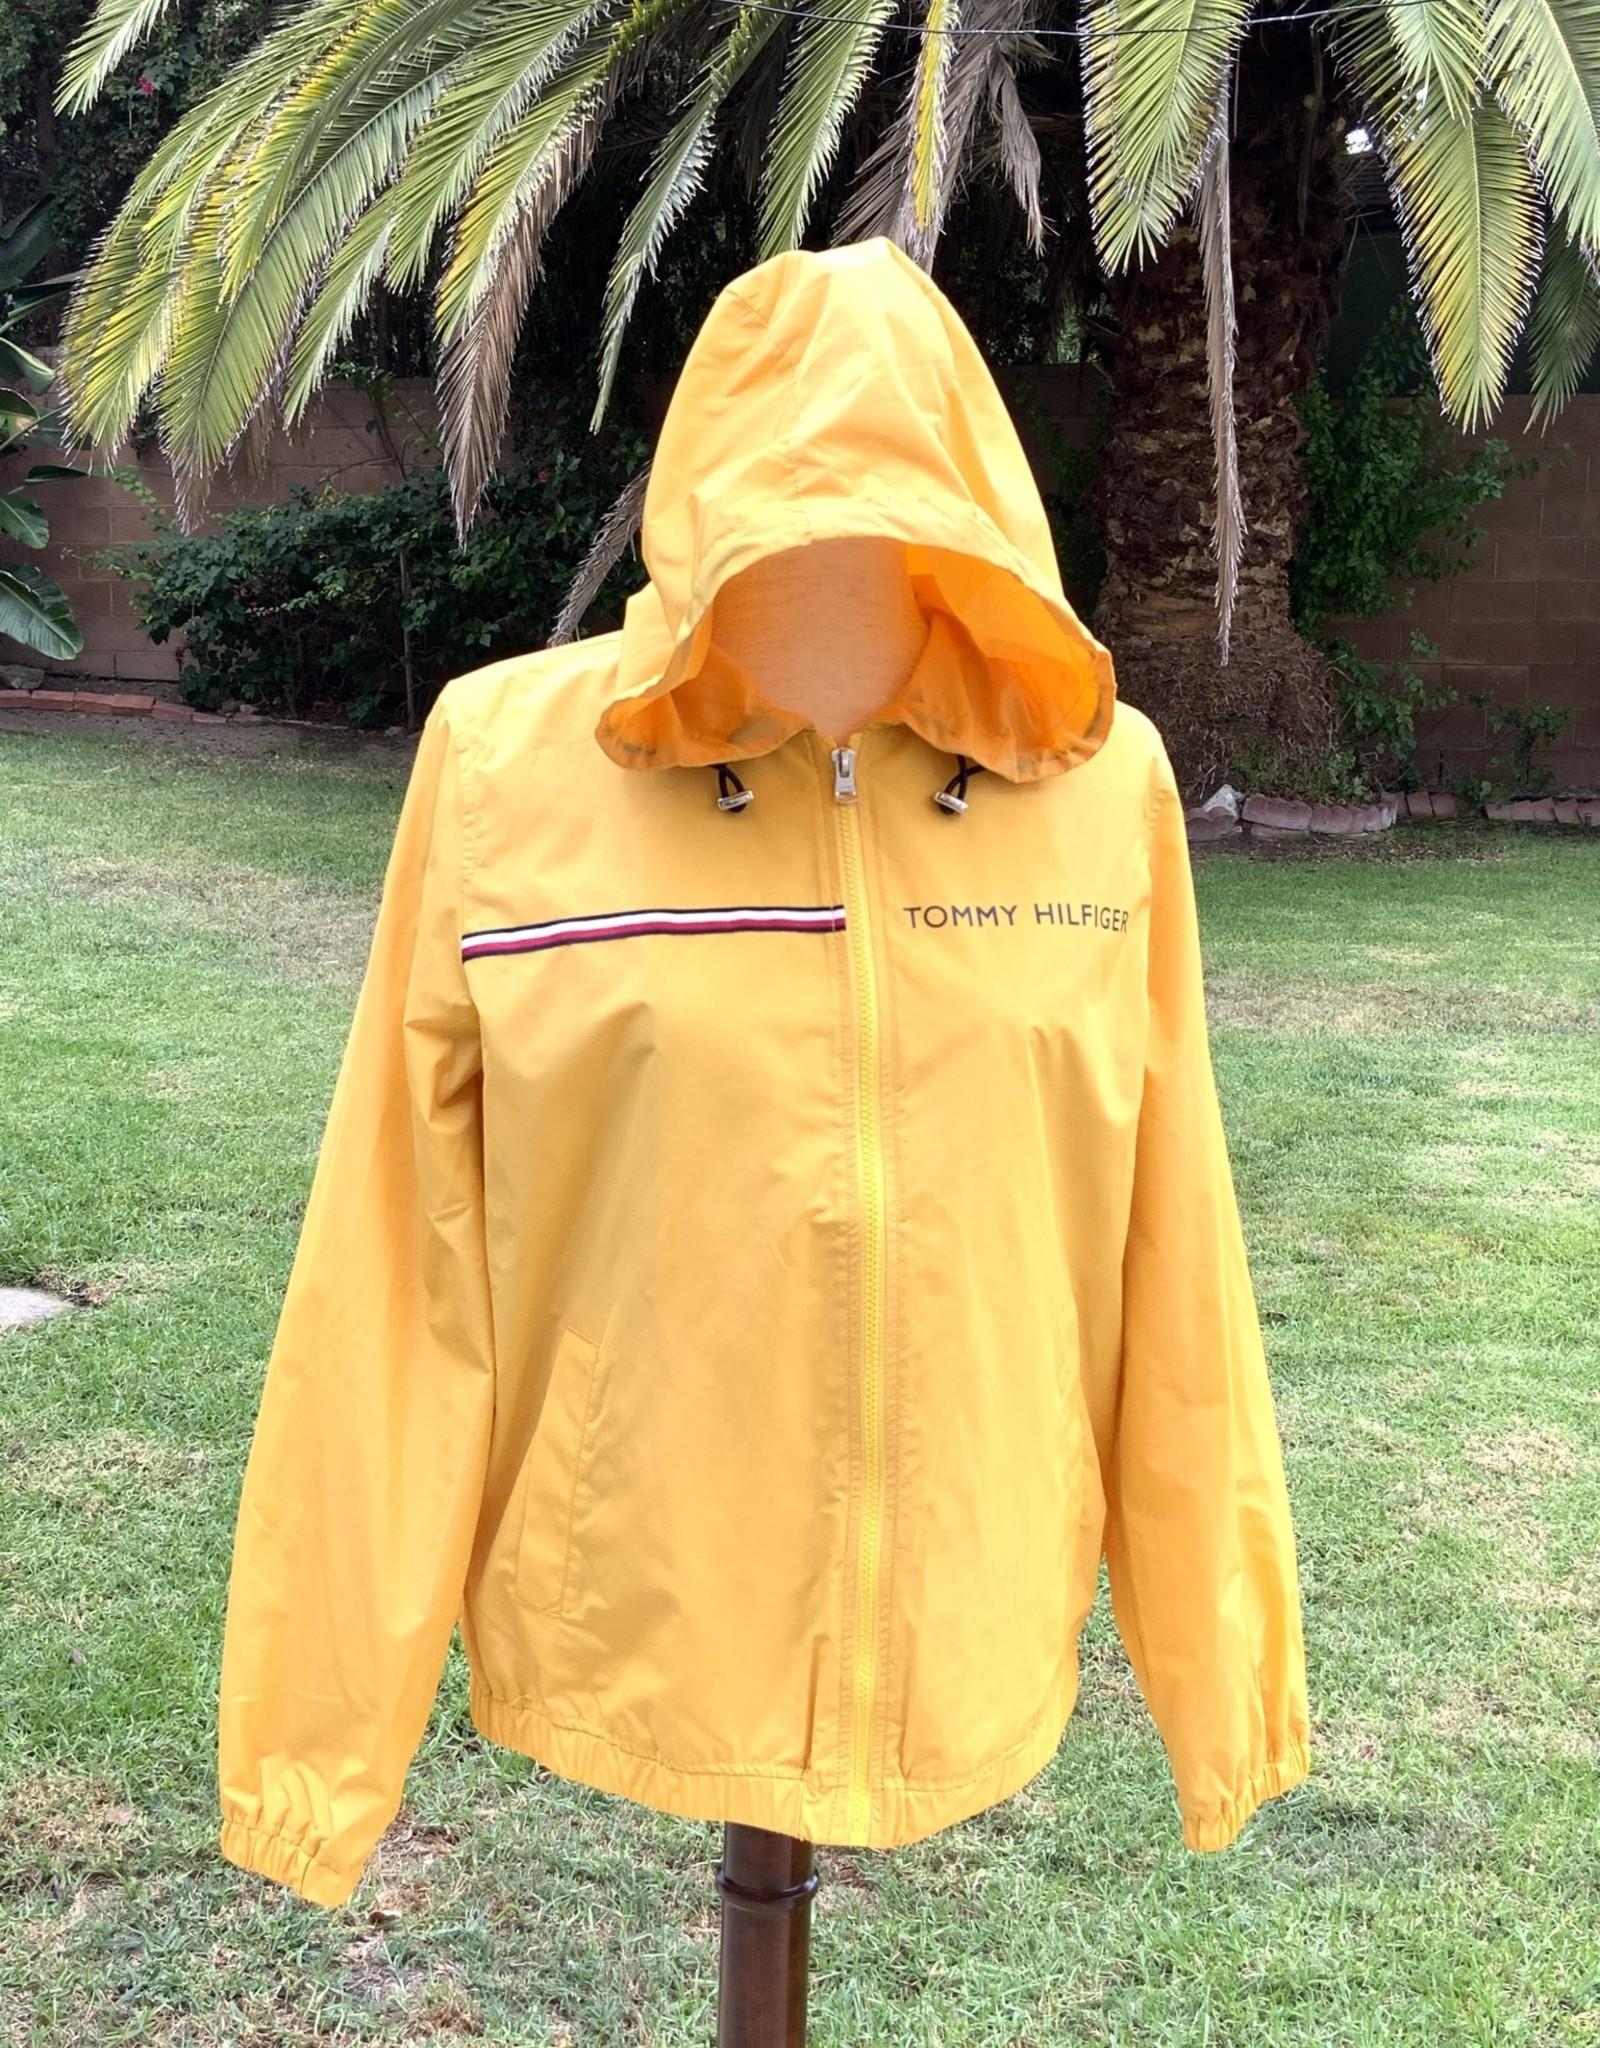 Tommy Hilfiger Tommy Hilfiger Hooded Zipped Up Jacket